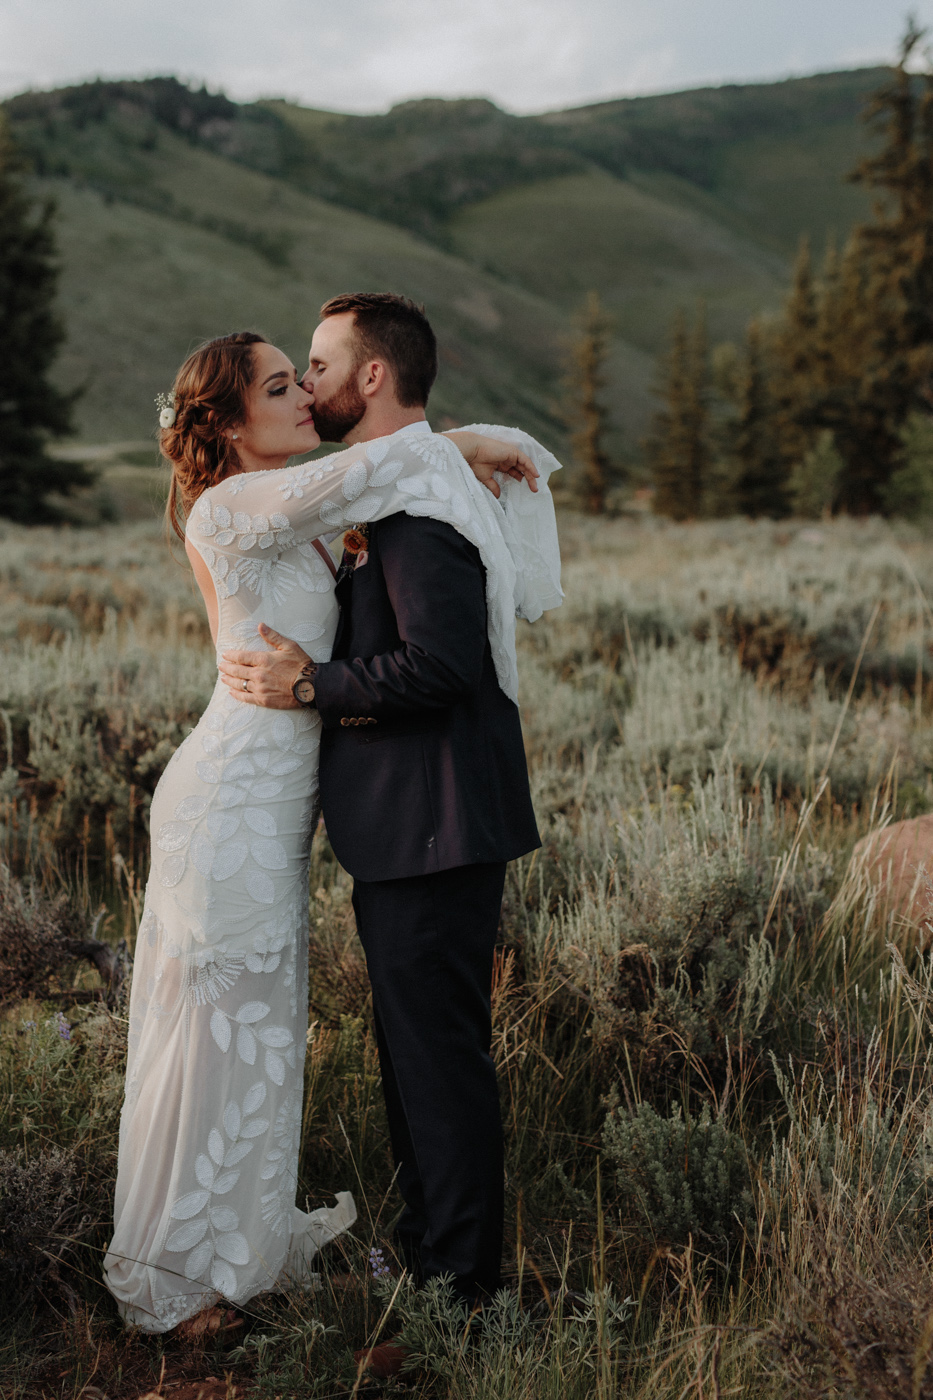 woods-walk-trail-crested-butte-colorado-wedding-130.jpg